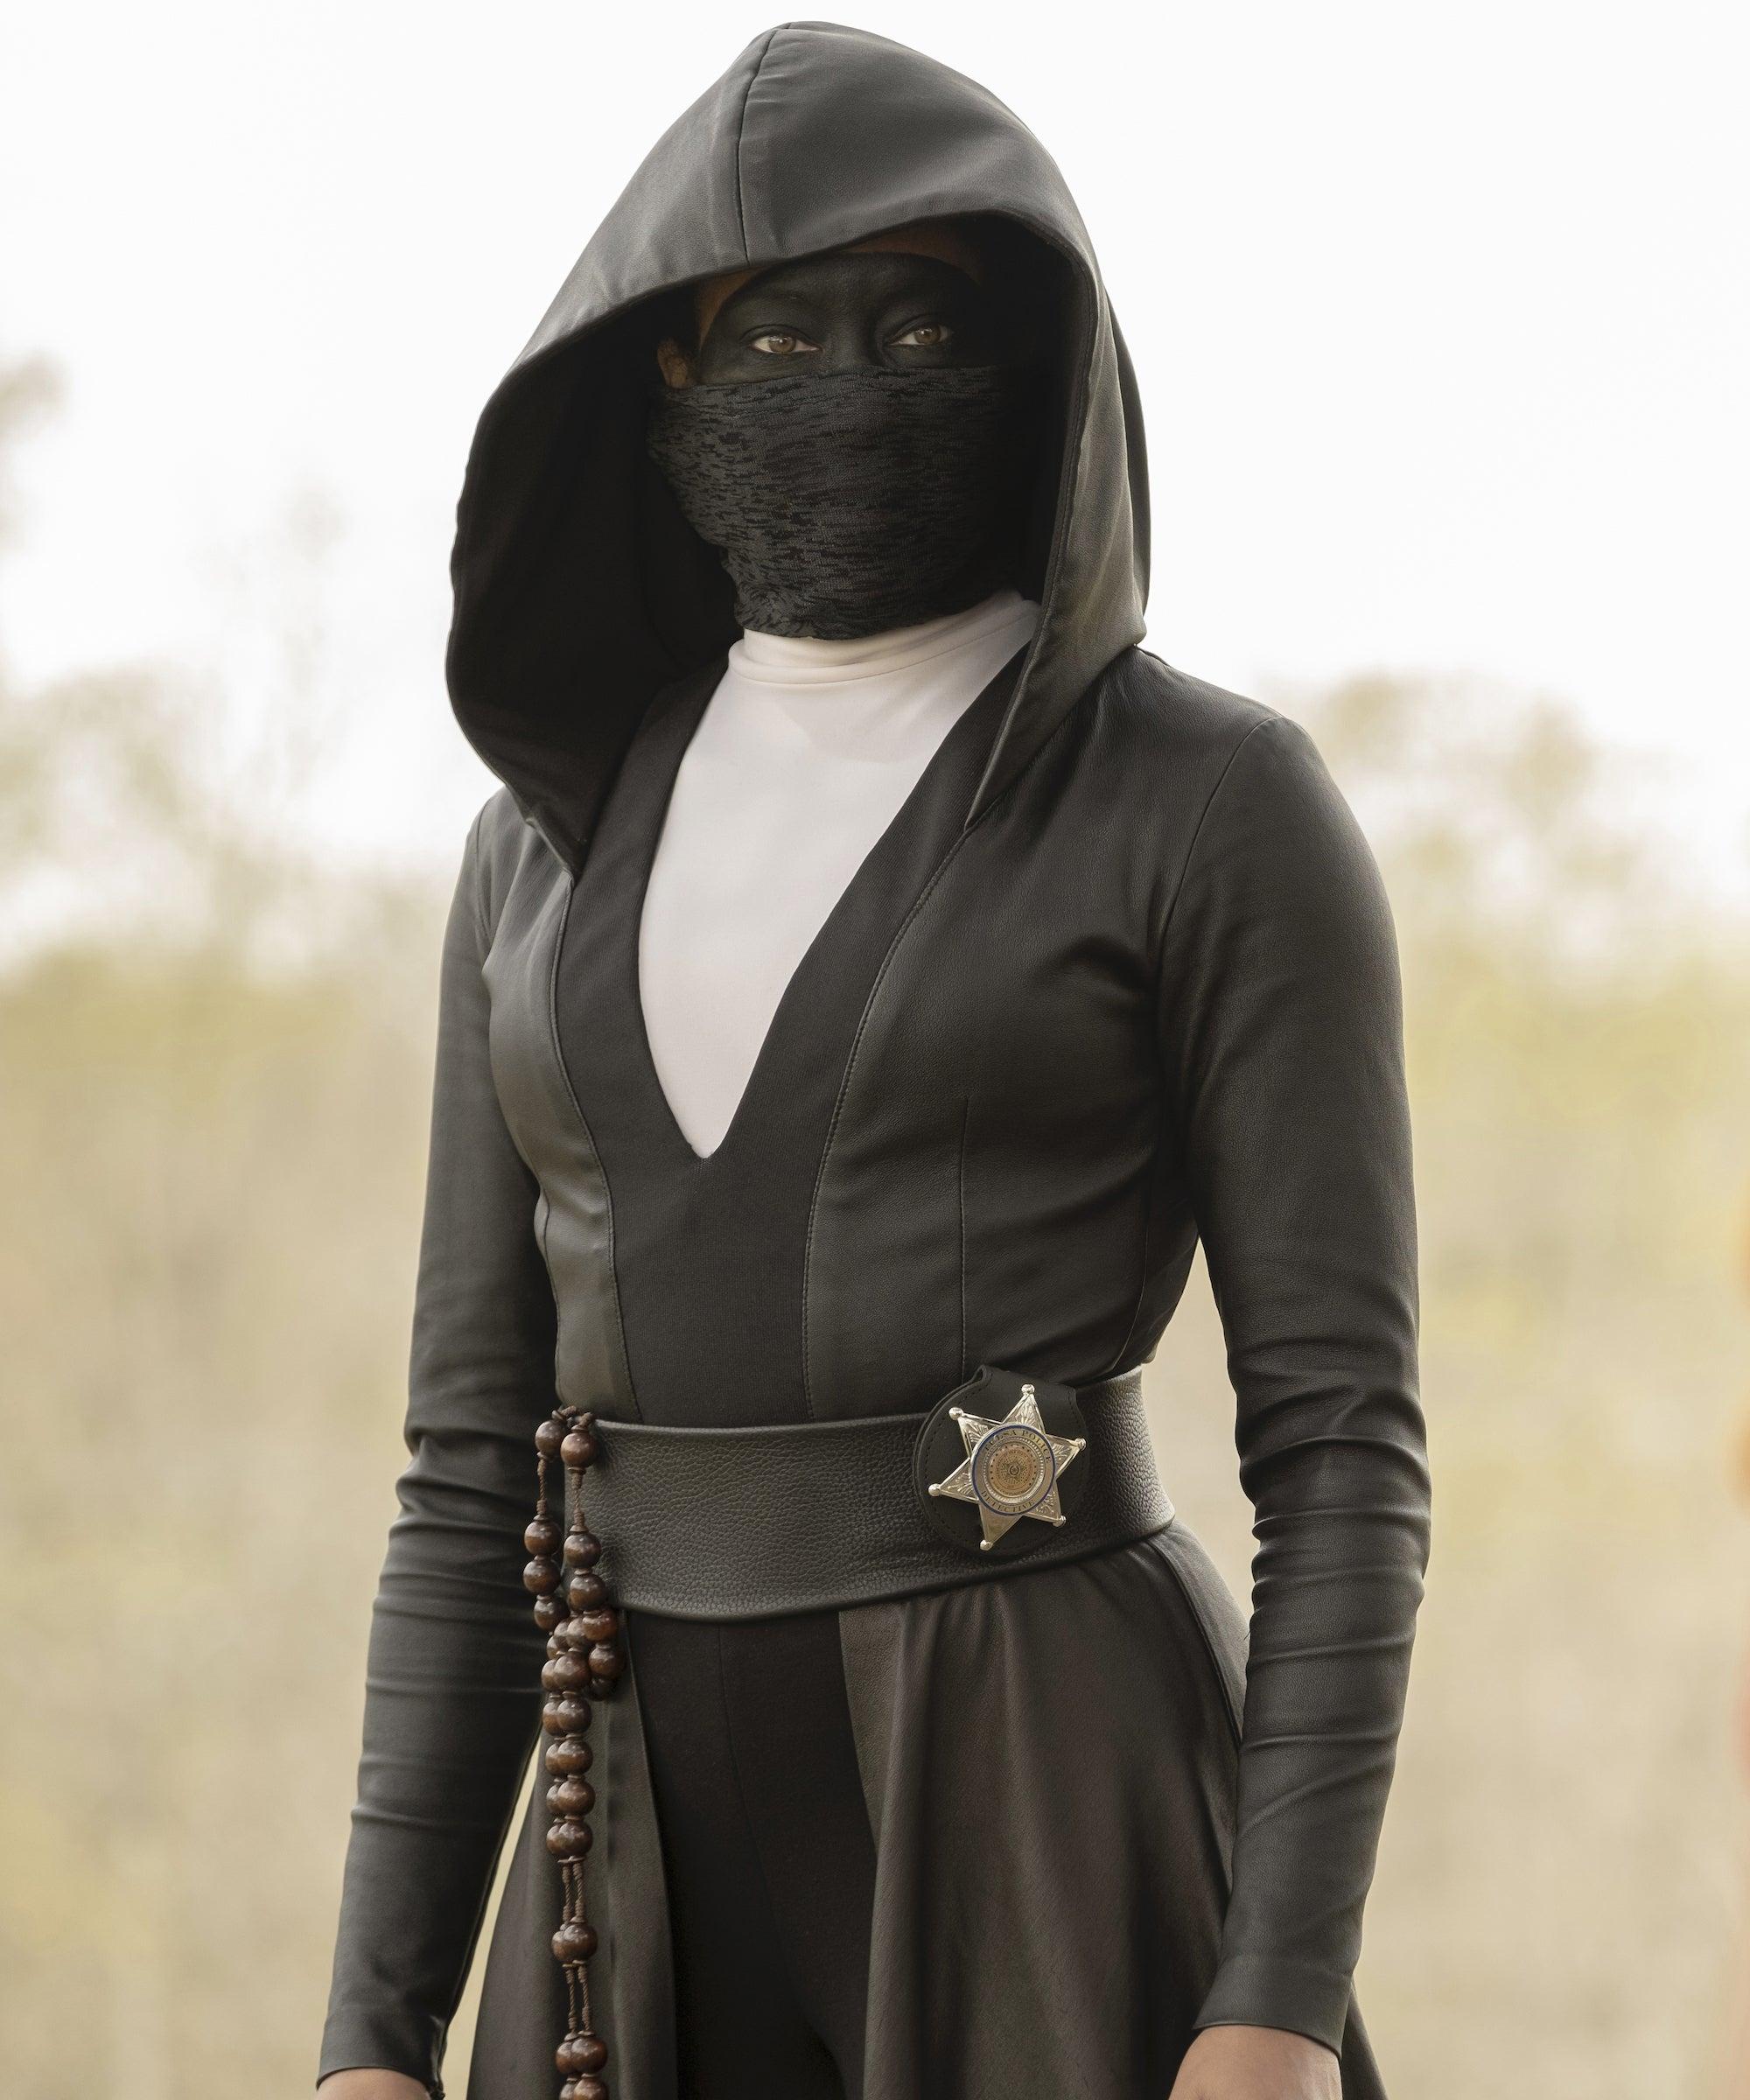 Making Sense Of That Gruesome Watchmen Premiere Death